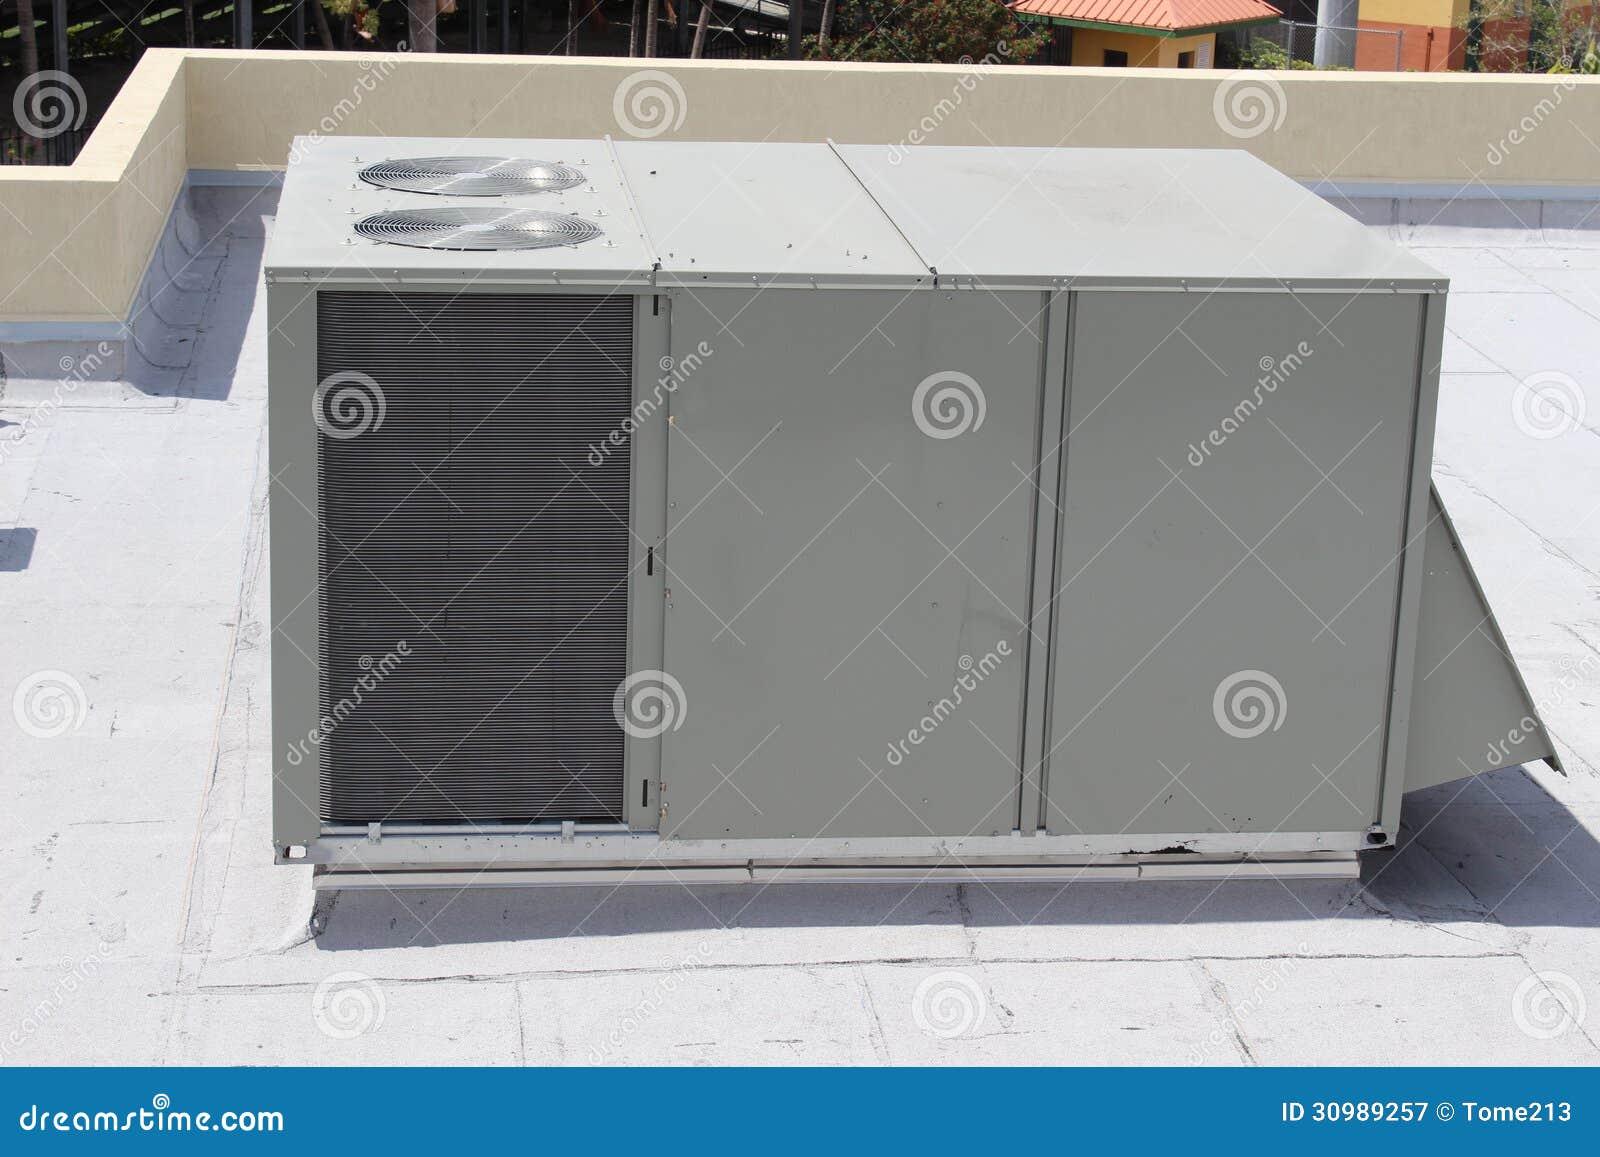 Air Conditioning Unit Air Conditioning Unit On Roof